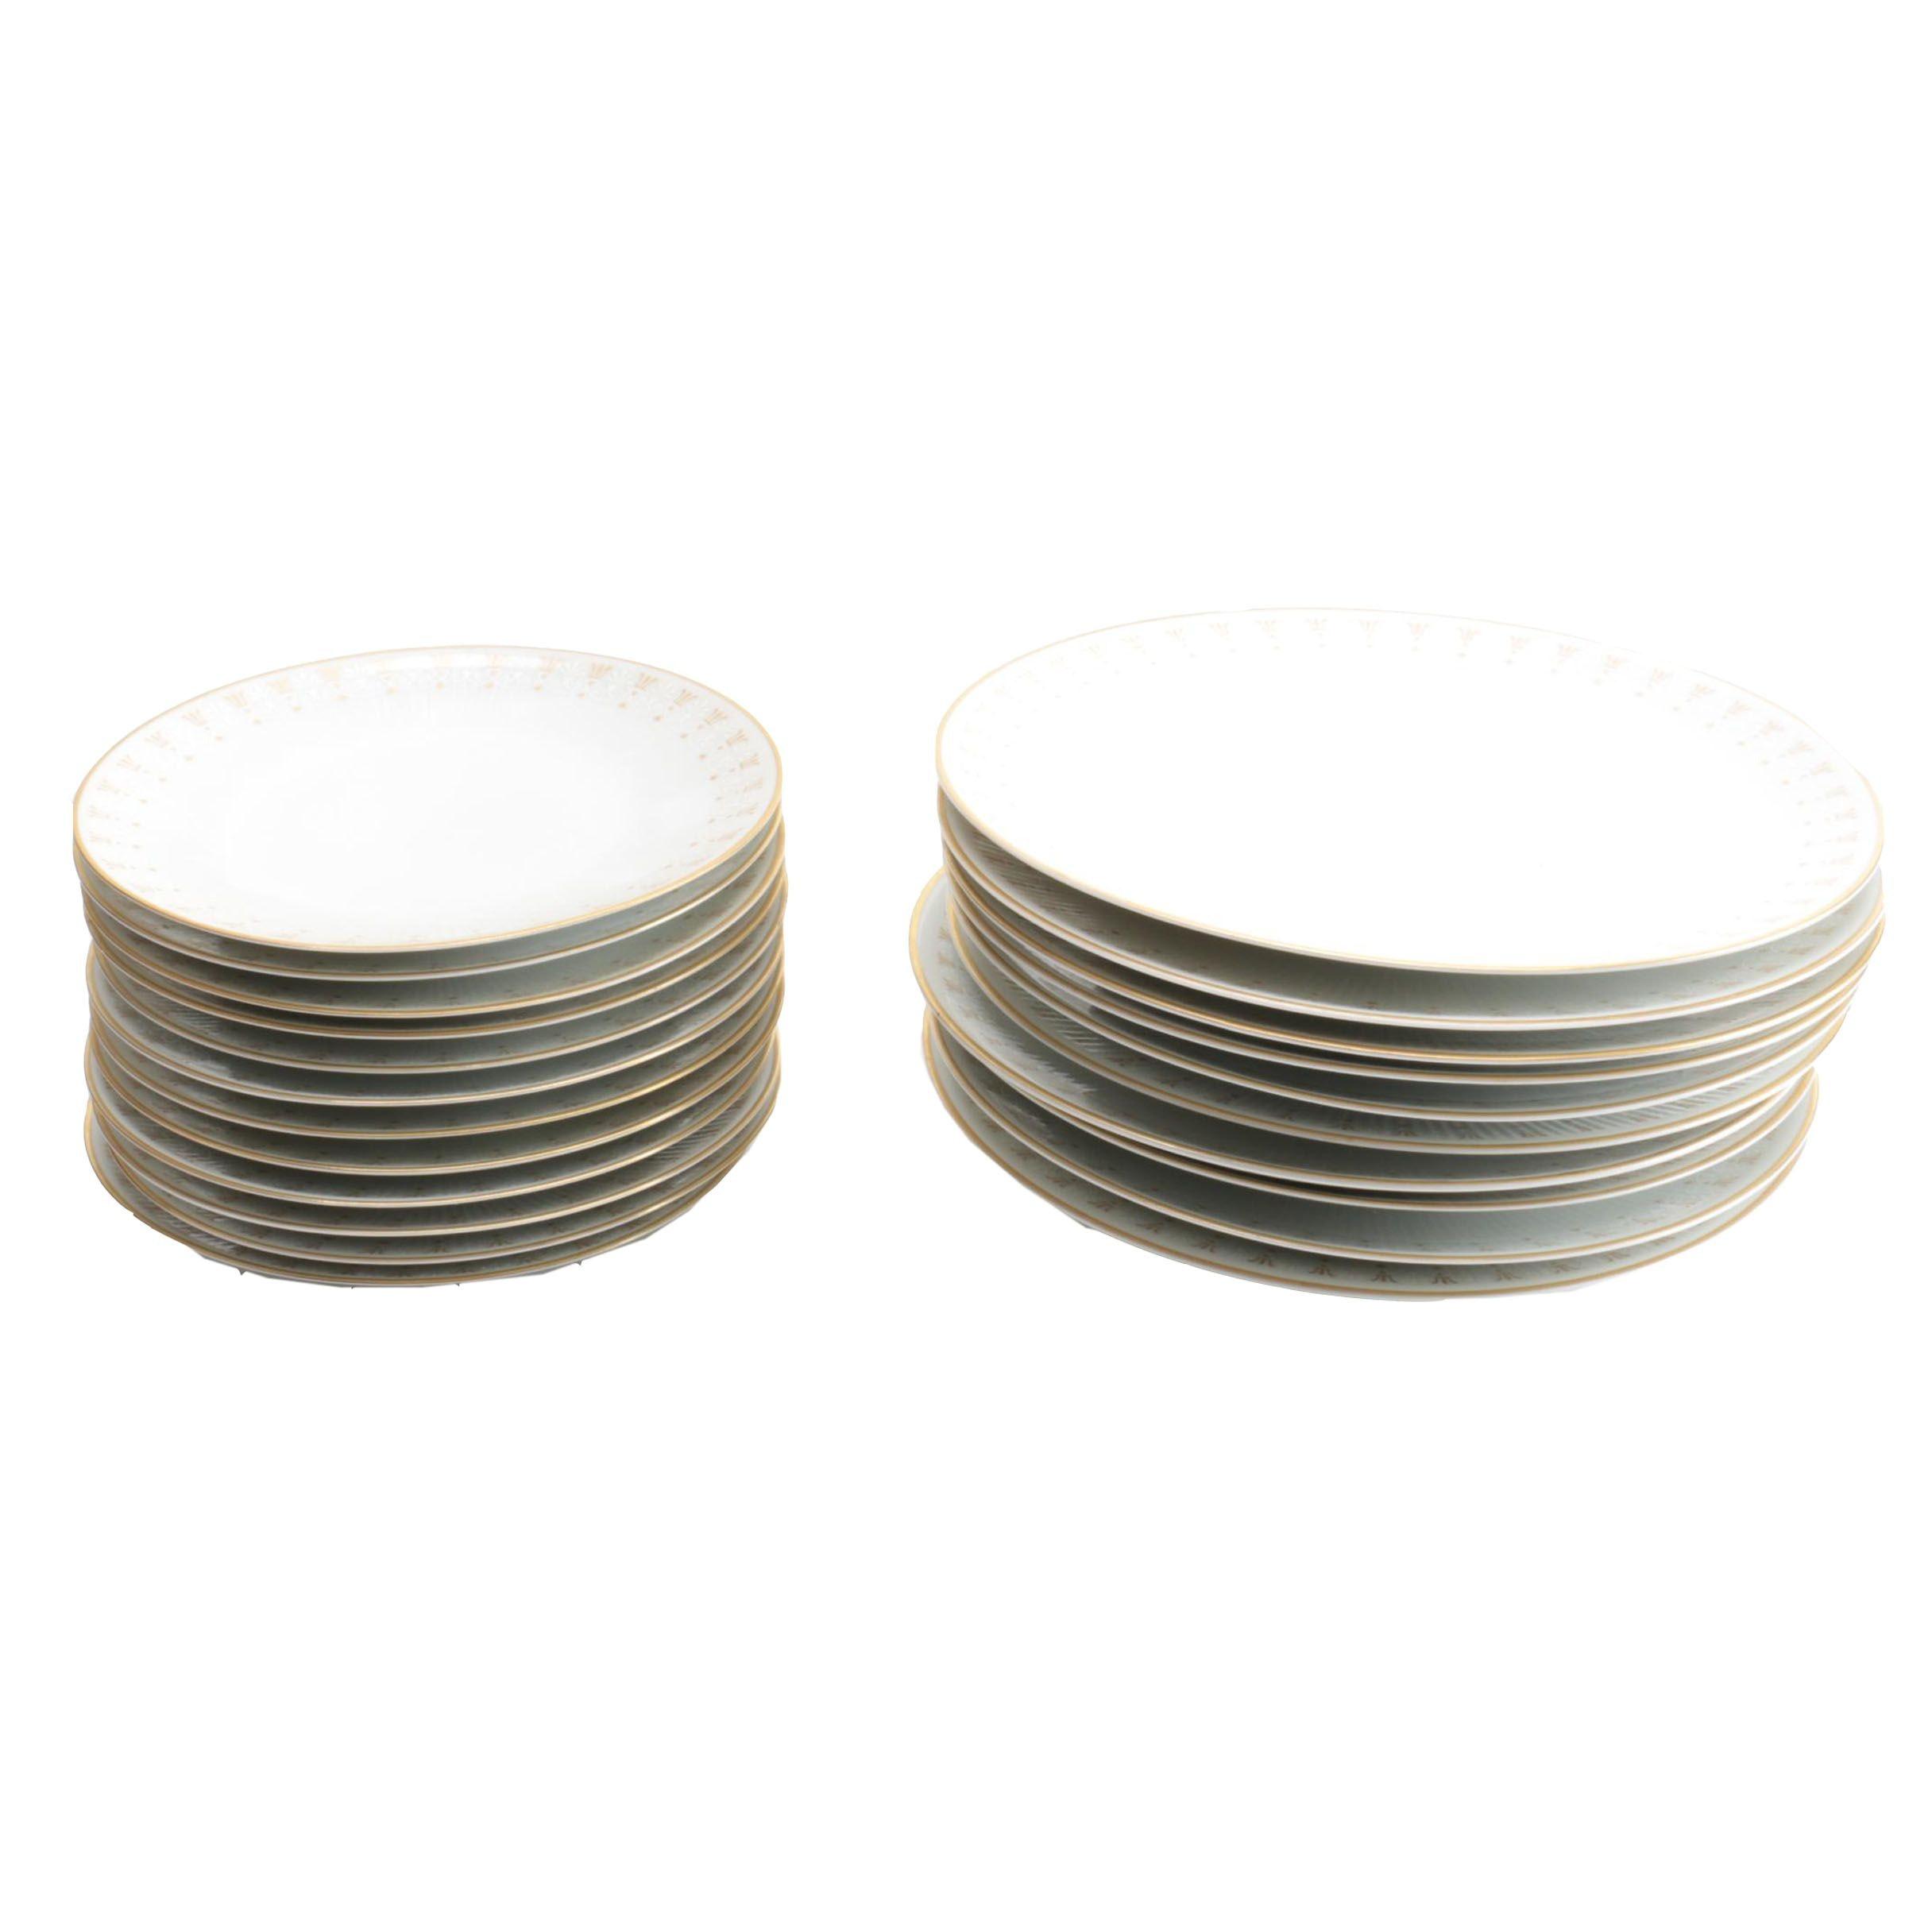 "Mitterteich ""Crown Royale"" Porcelain Tableware"